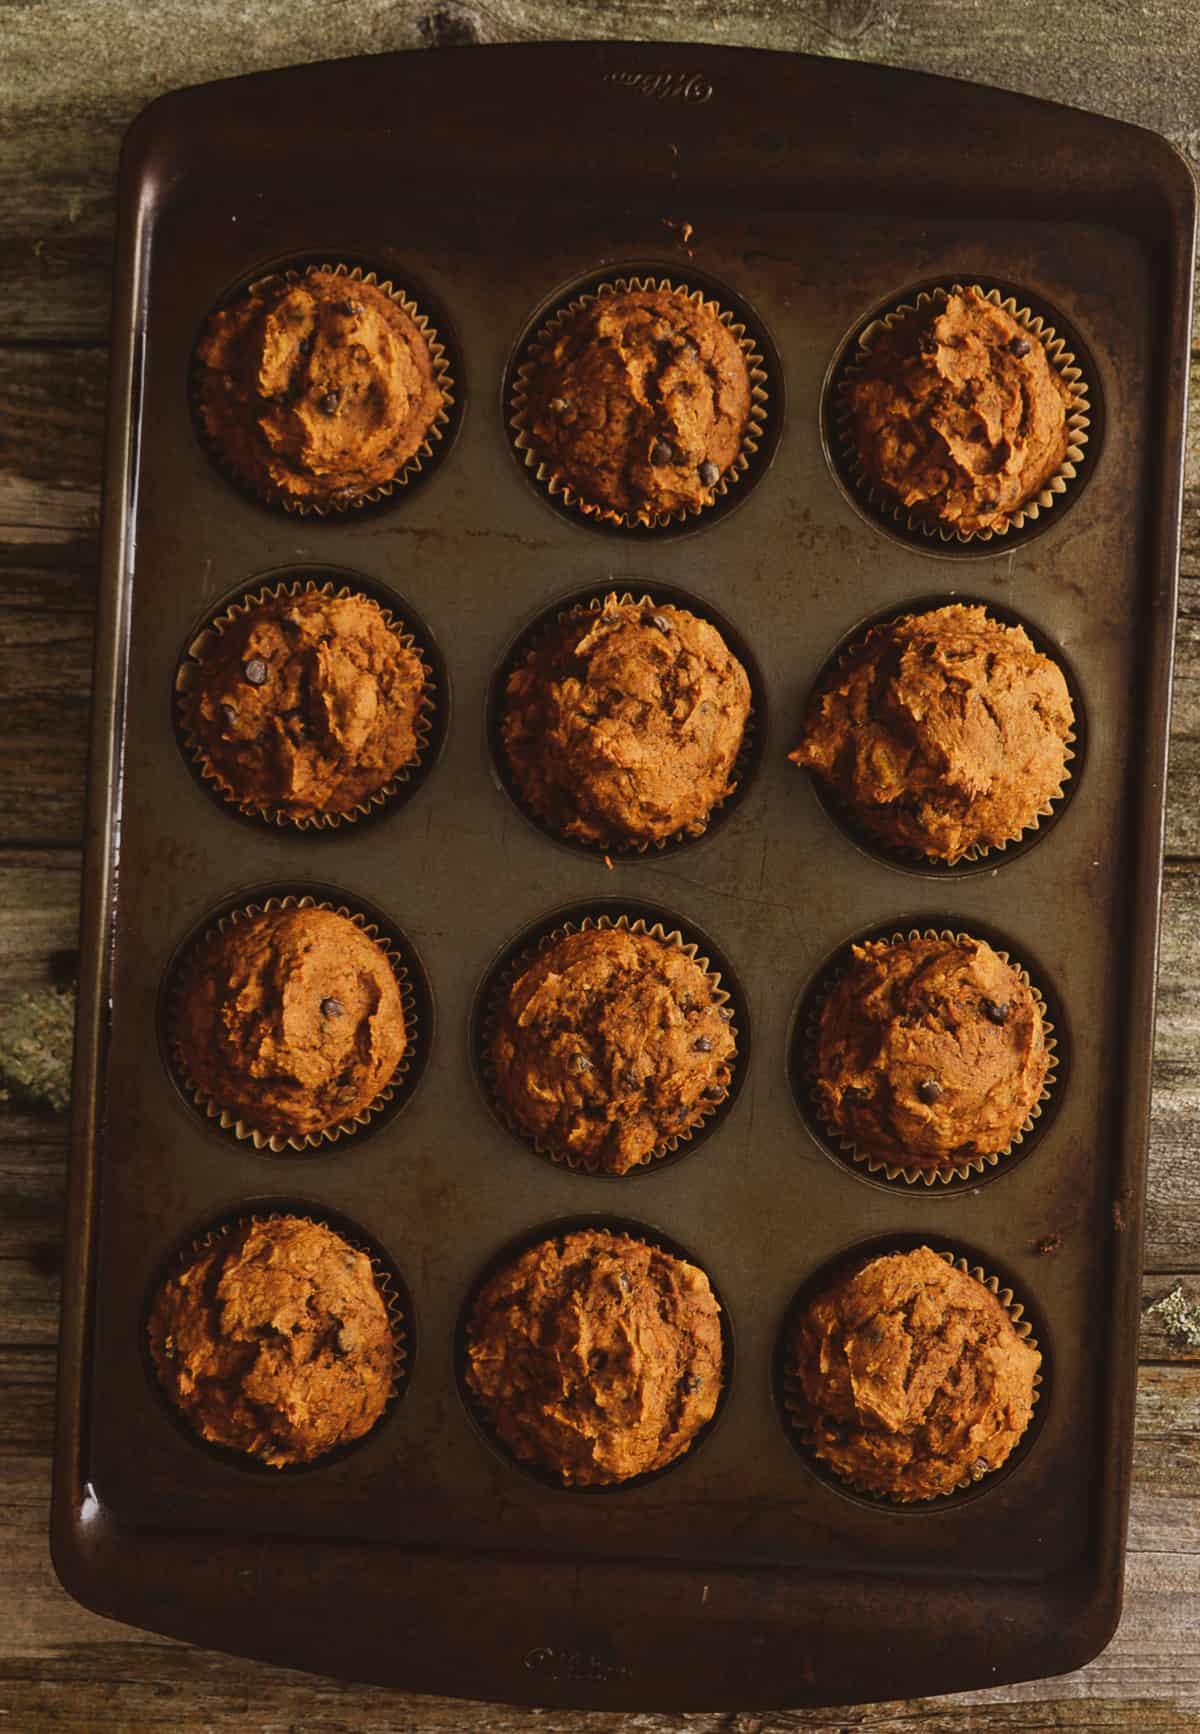 Pumpkin muffins in baking tray.